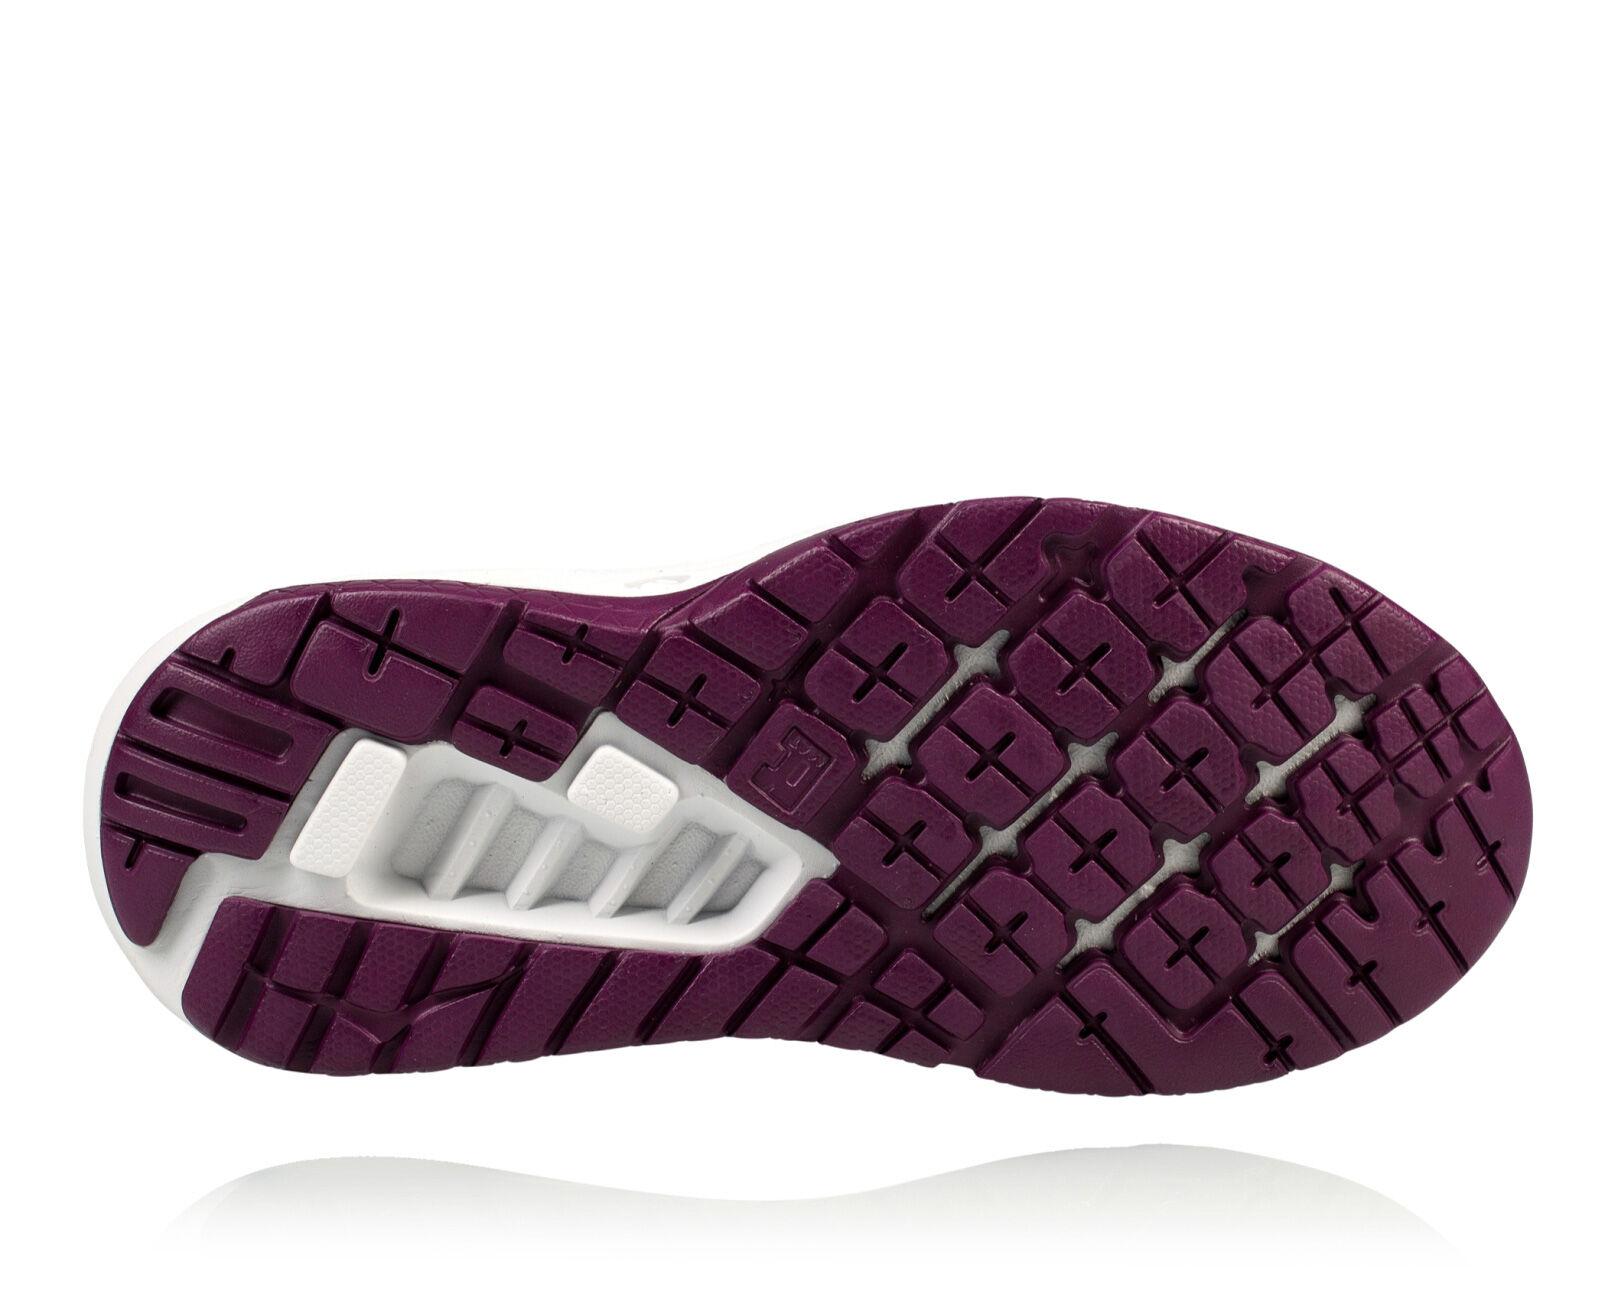 Hoka One One Kona Clayton 2 Pickled Beet Purple Running Tennis Shoes 1019678 sz